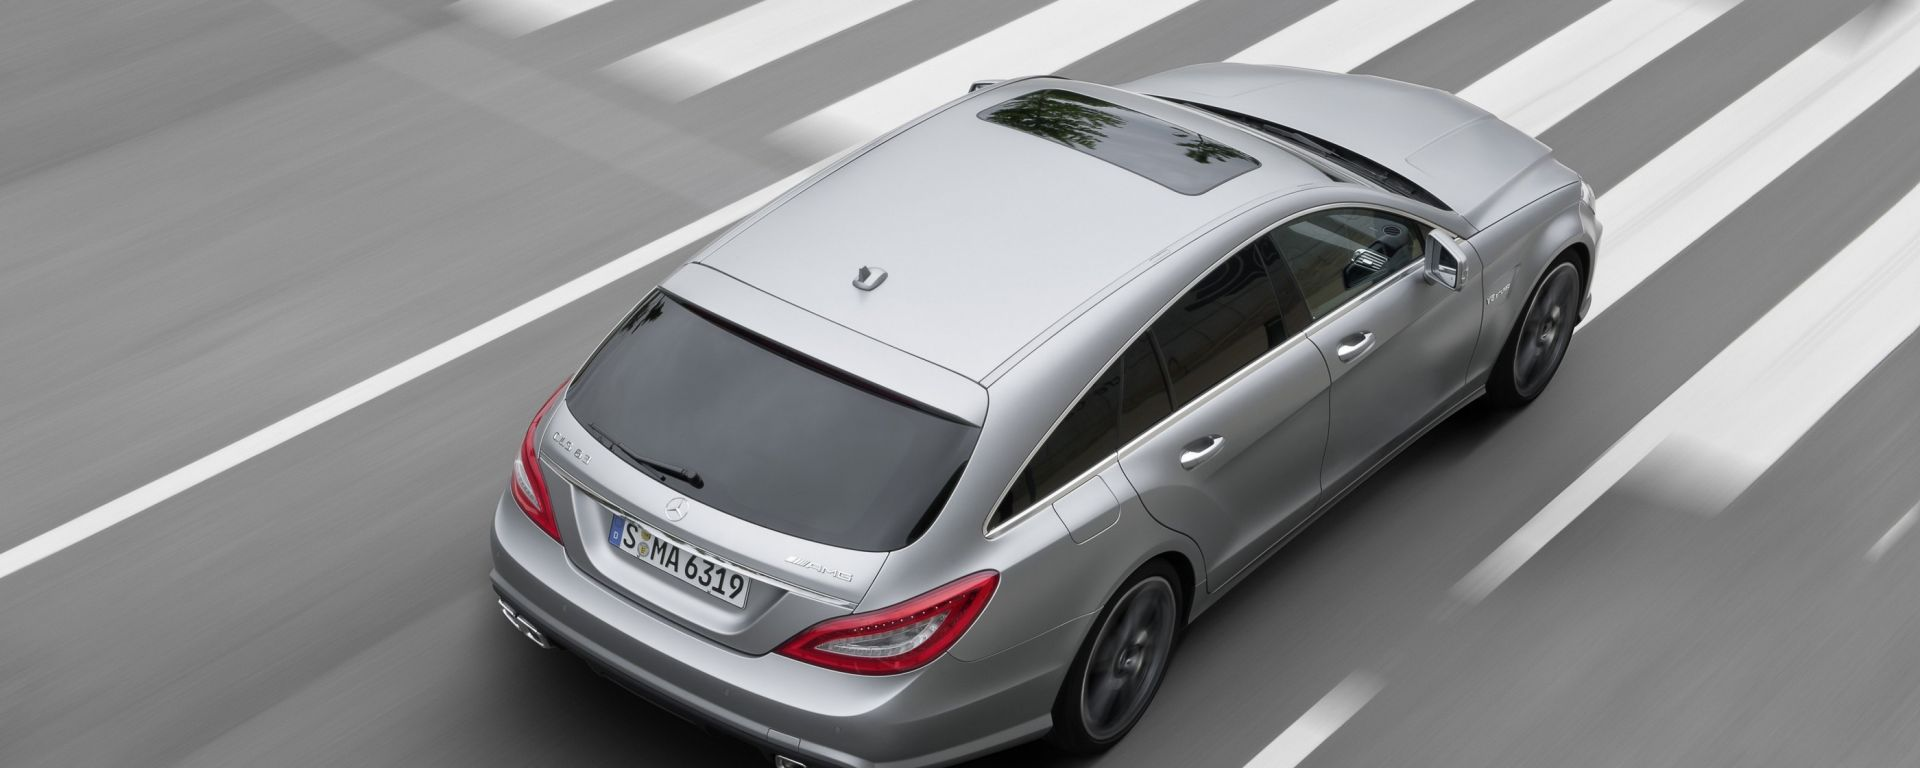 Mercedes CLS 63 AMG Shooting Brake, c'è anche un video